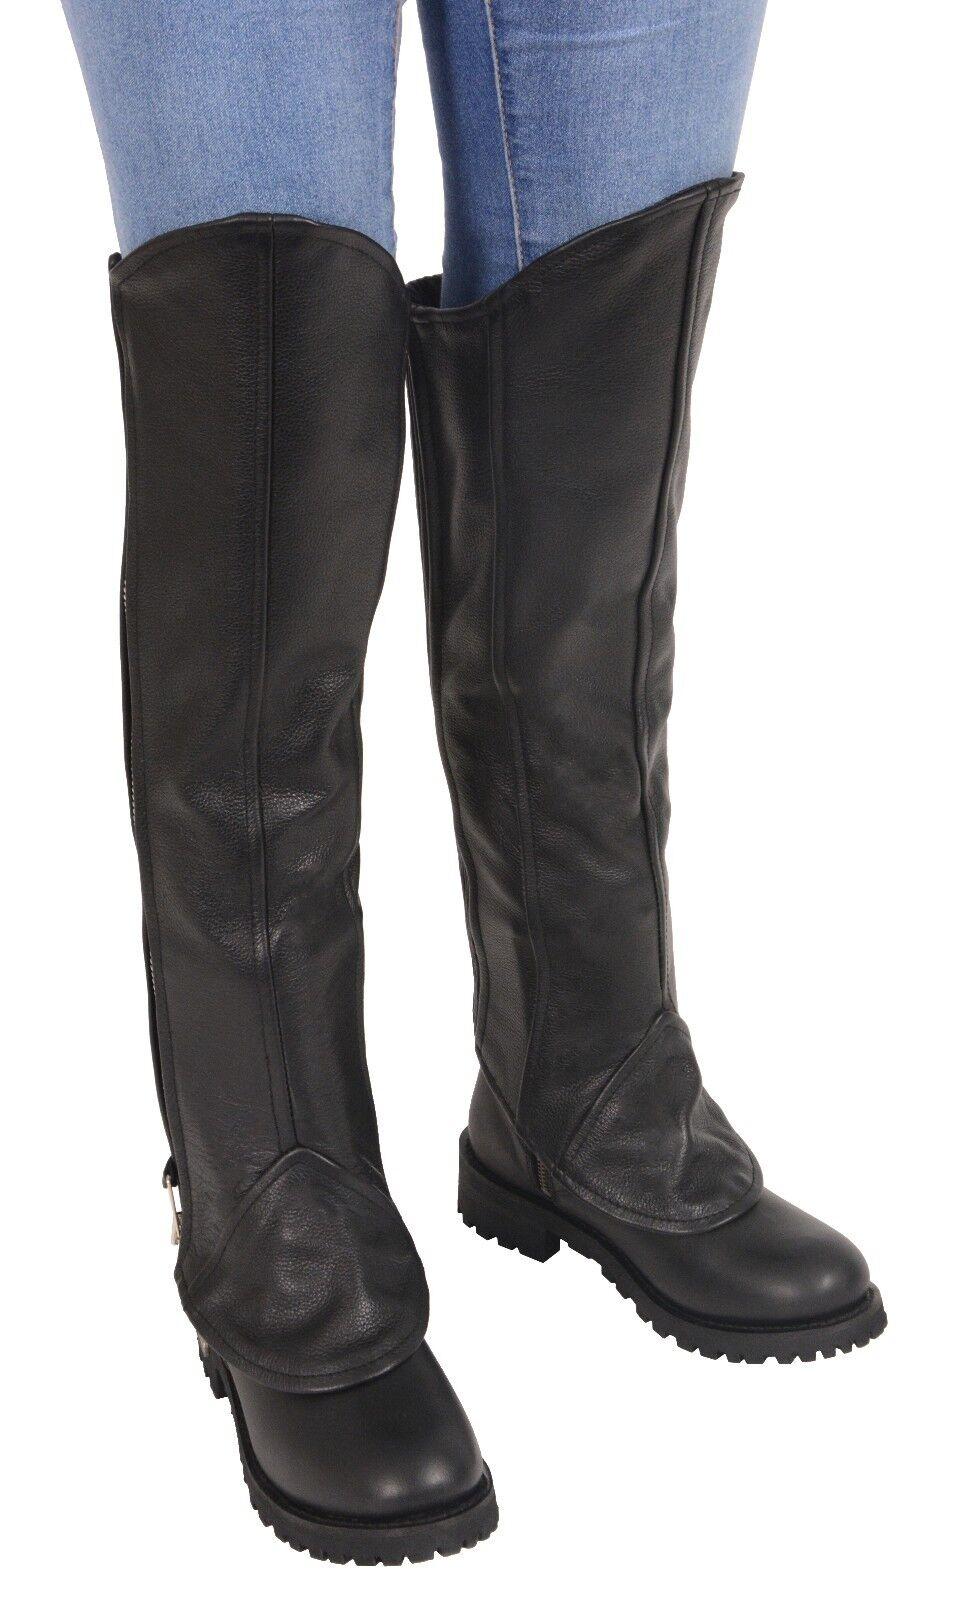 Ladies Leather Knee High Half Chap Leggings w  Zipper Entry  - LKL6755